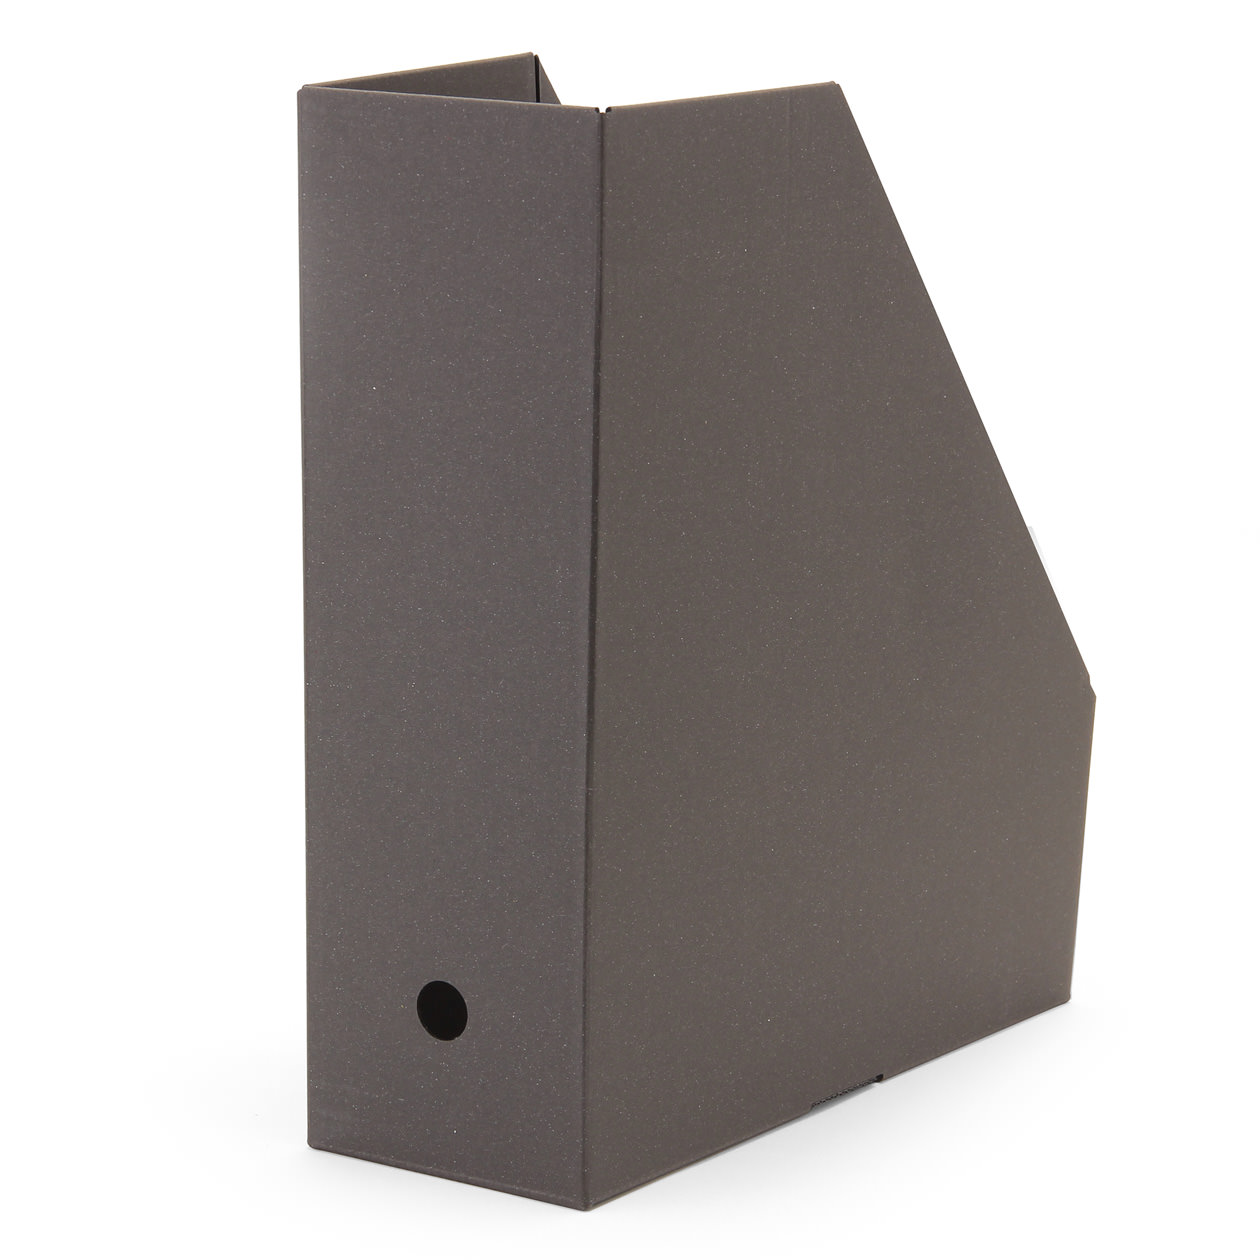 RoomClip商品情報 - ワンタッチで組み立てられるダンボールスタンドファイルボックス A4用・5枚組・ダークグレー